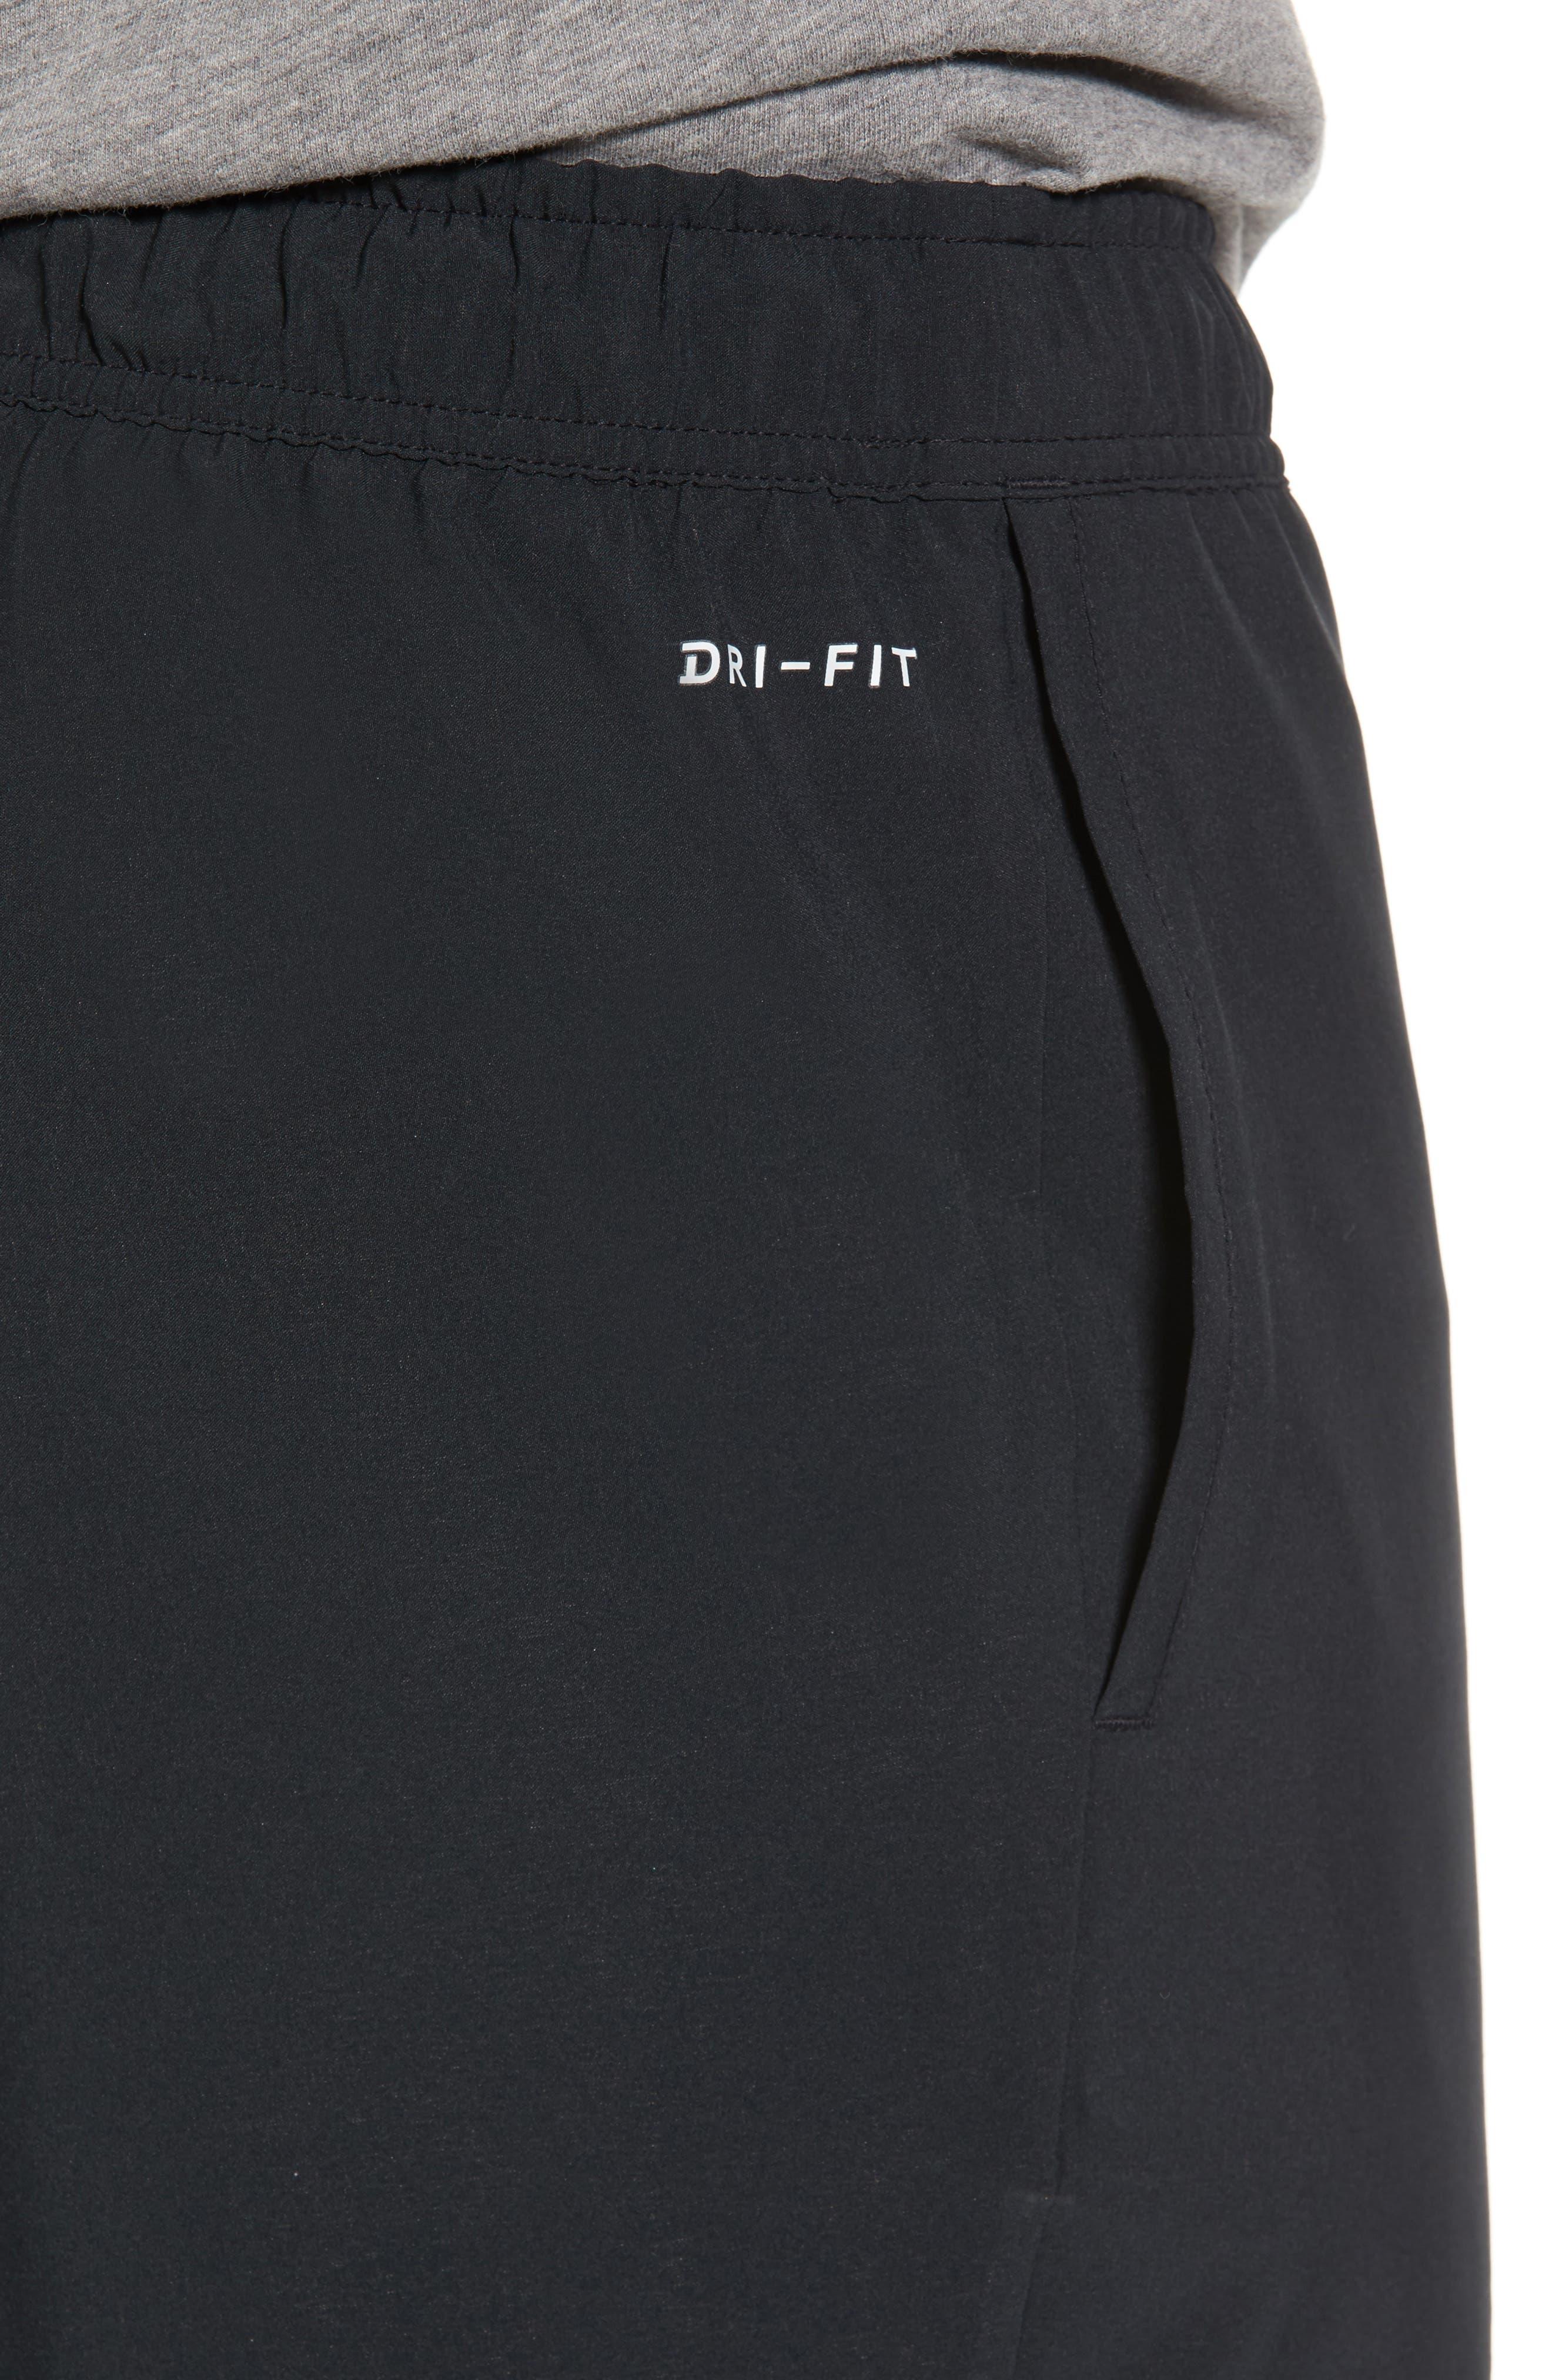 Training Flex PX Shorts,                             Alternate thumbnail 4, color,                             BLACK/ WHITE/ WHITE